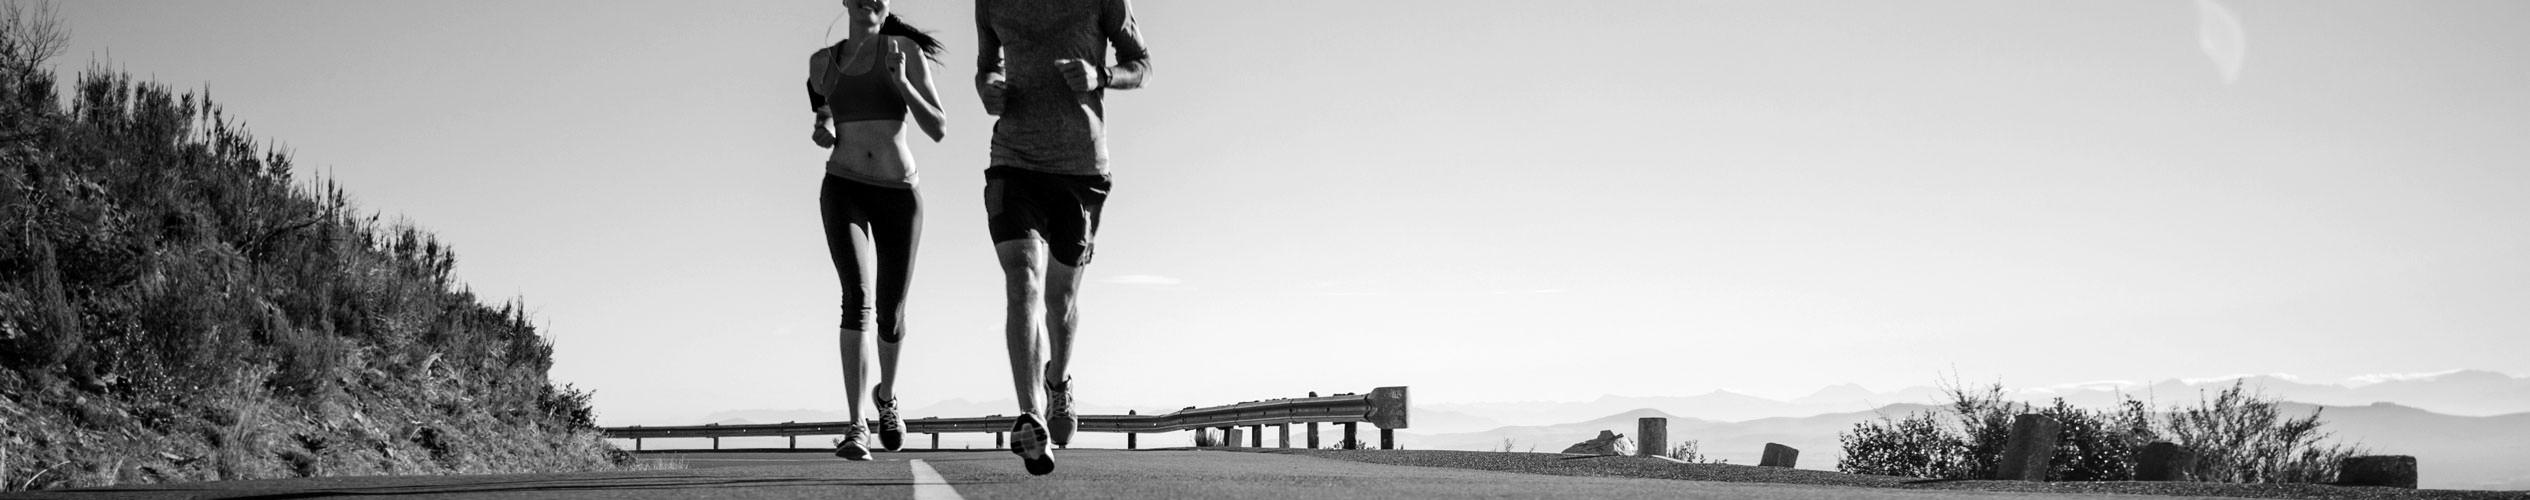 Sportortho Rosenheim - Sportmedizin und Chirotherapie